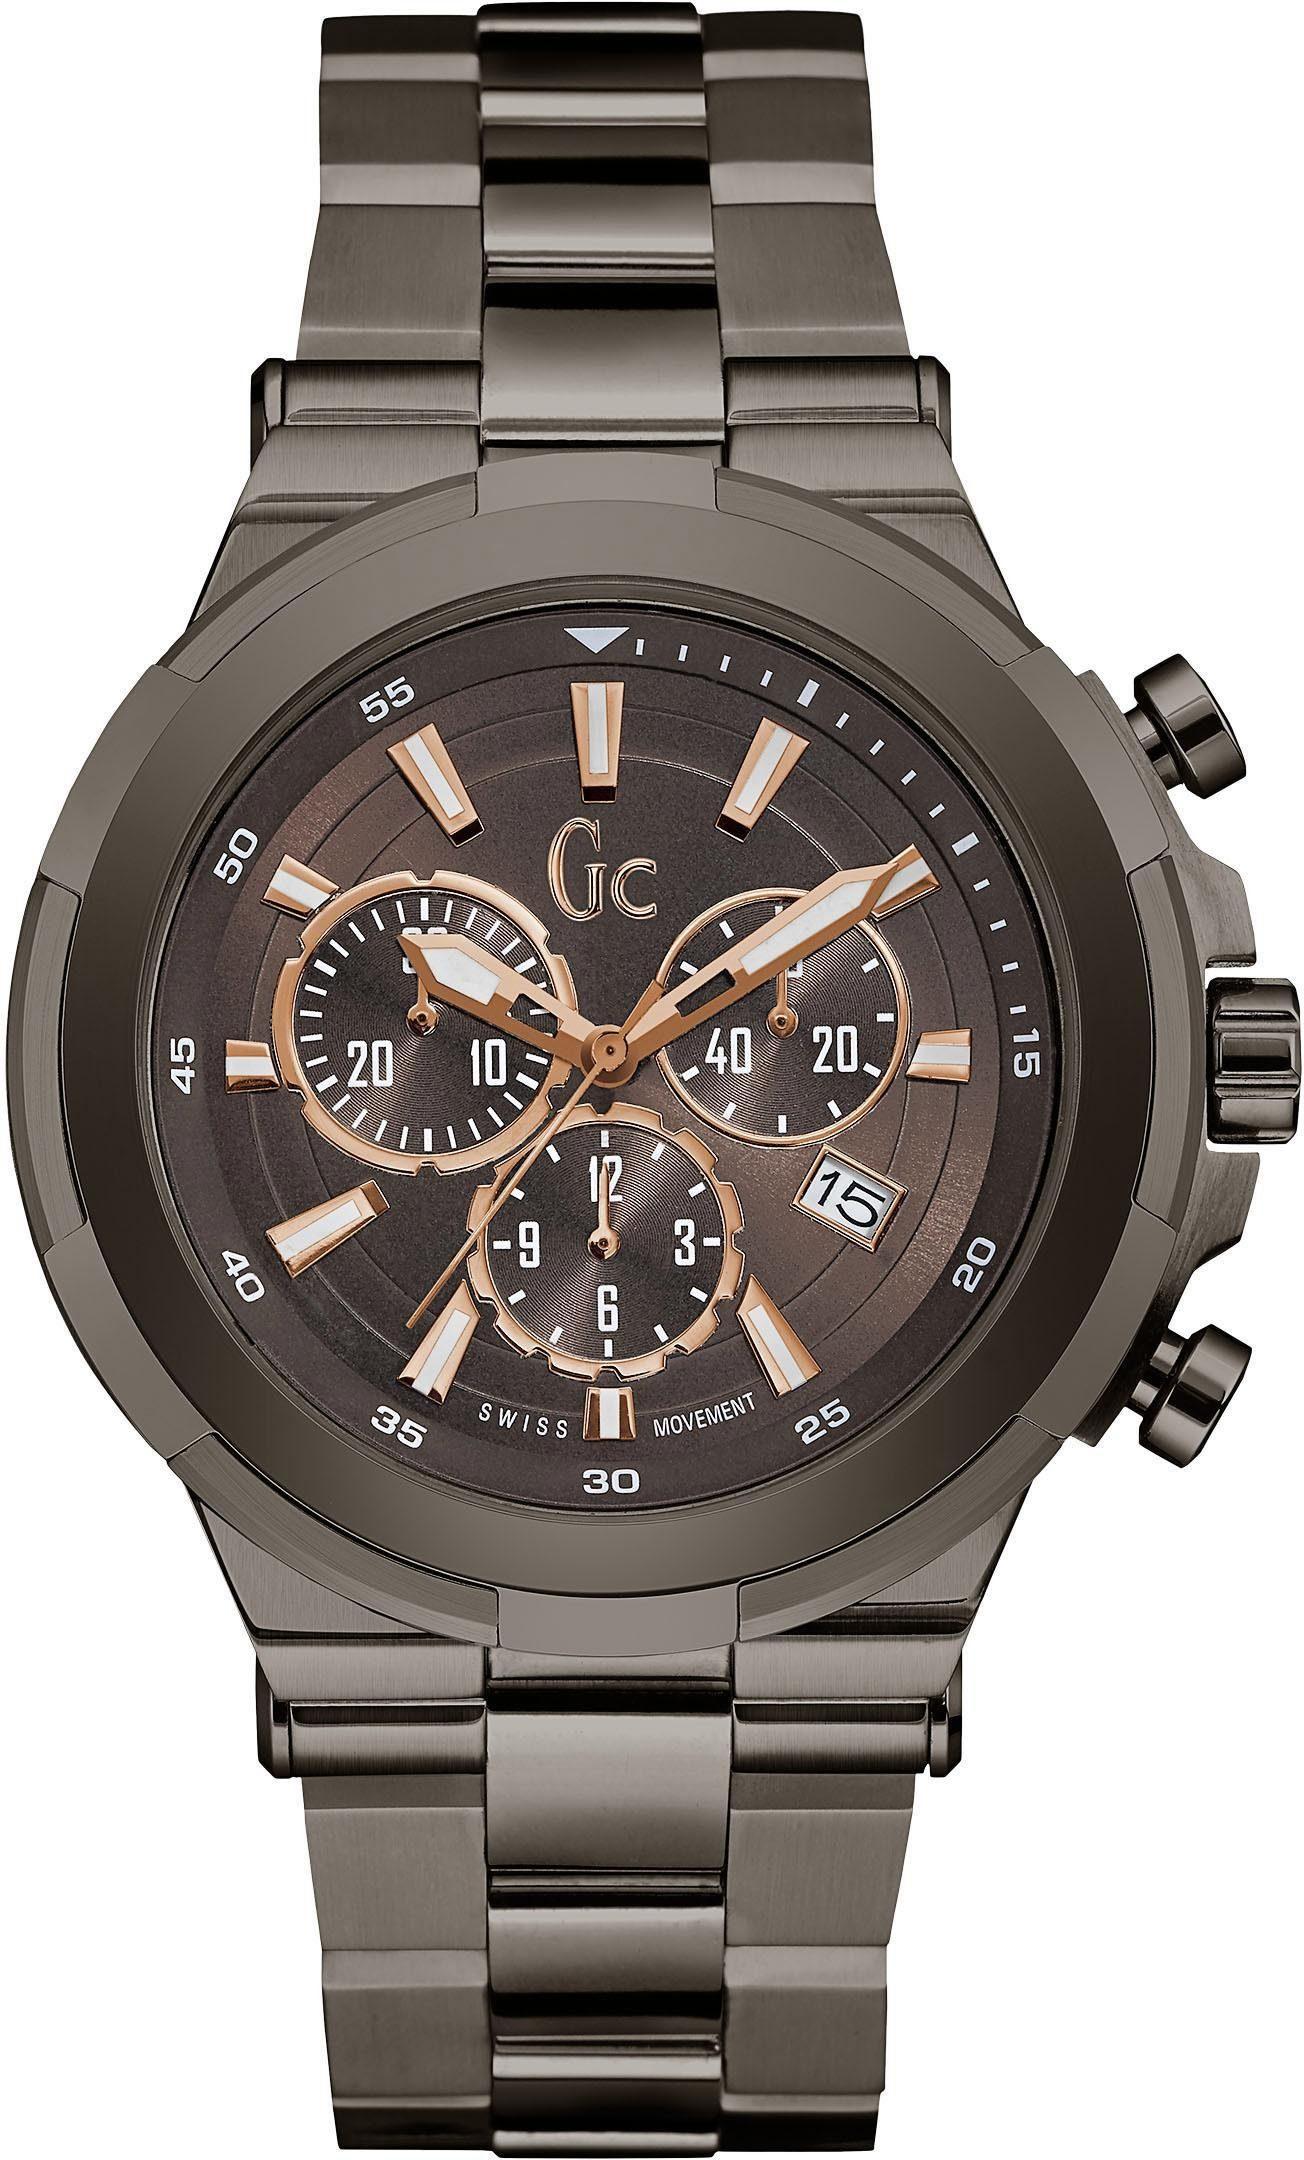 GC Chronograph »Gc Structura, Y23004G4«